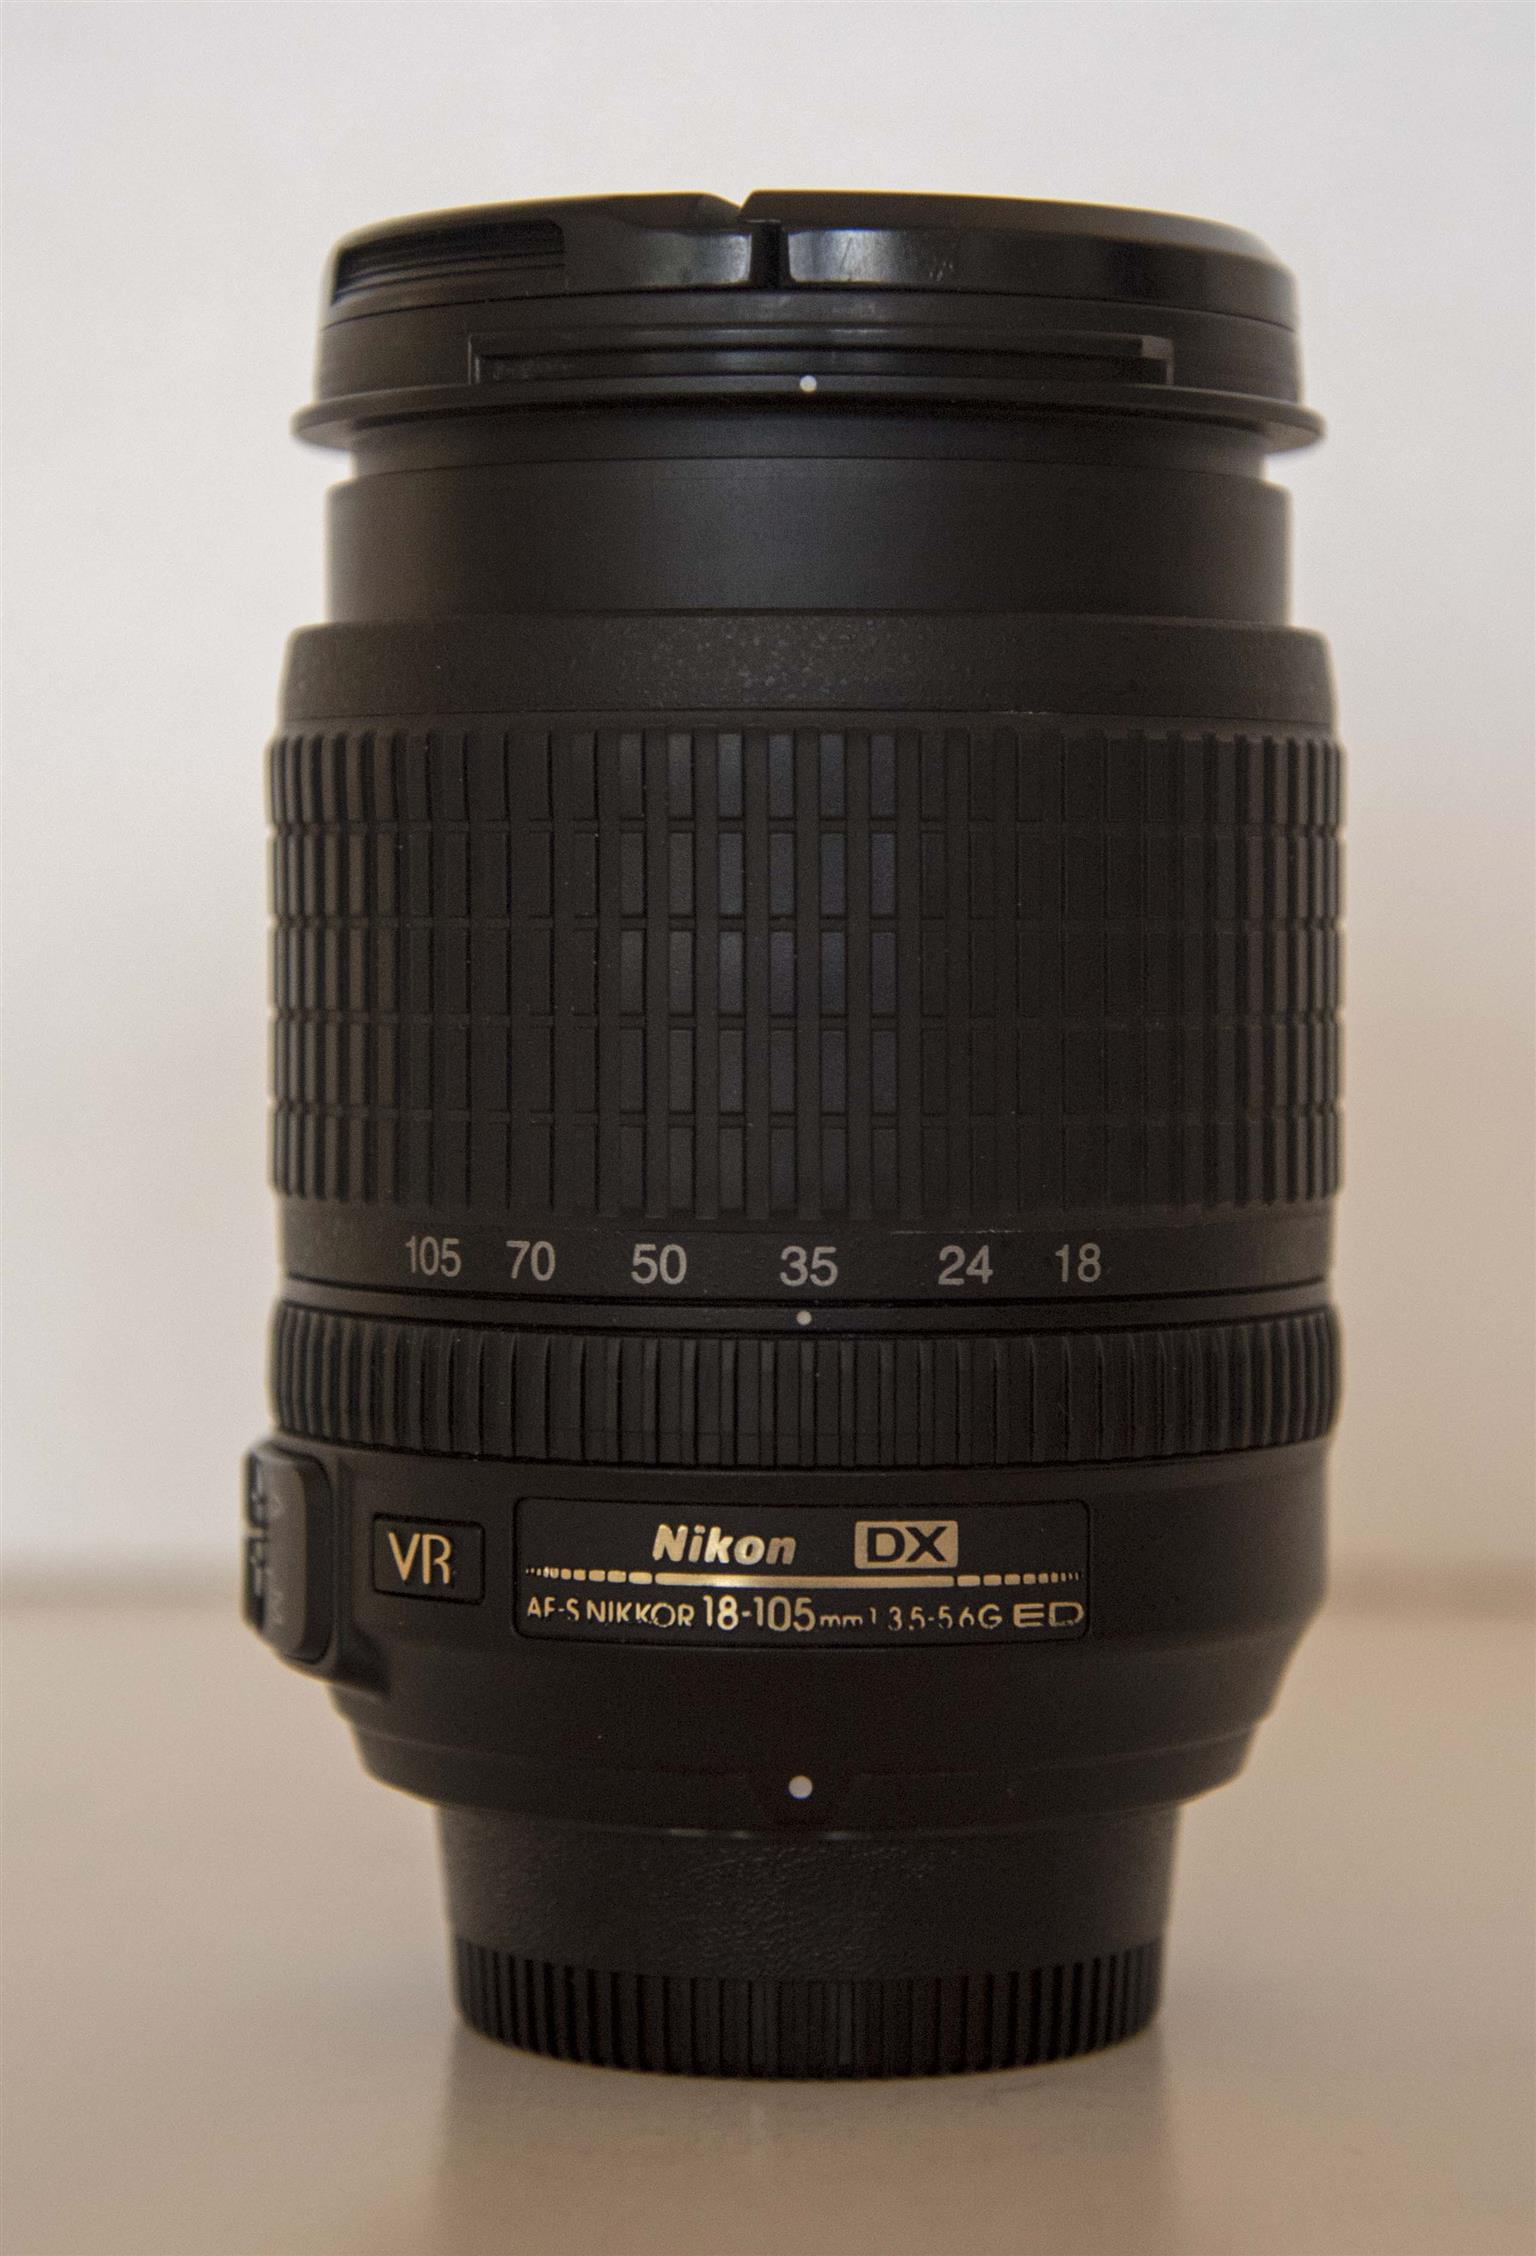 Nikon 18-105 mm. lens